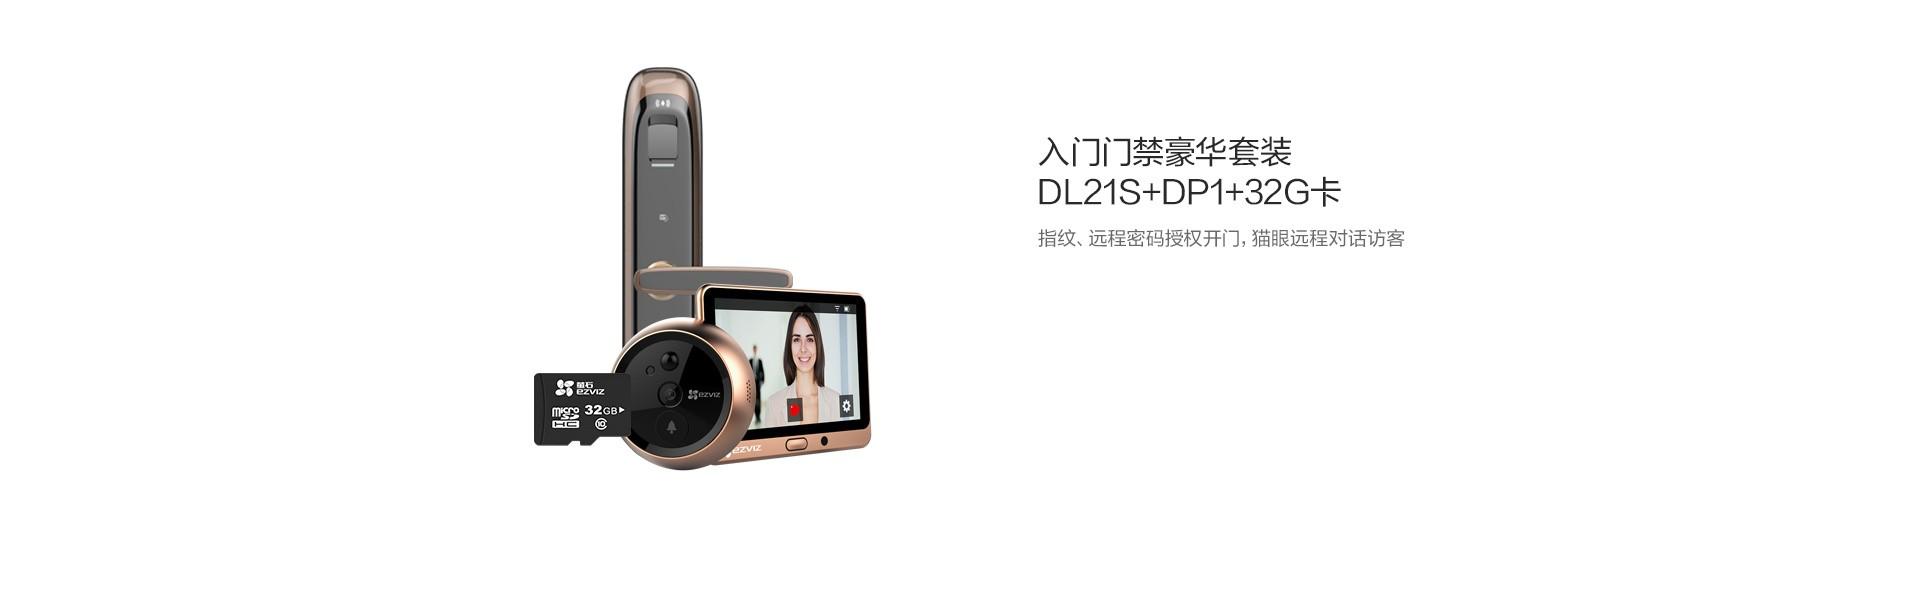 DL21S+DP1+32G卡.jpg